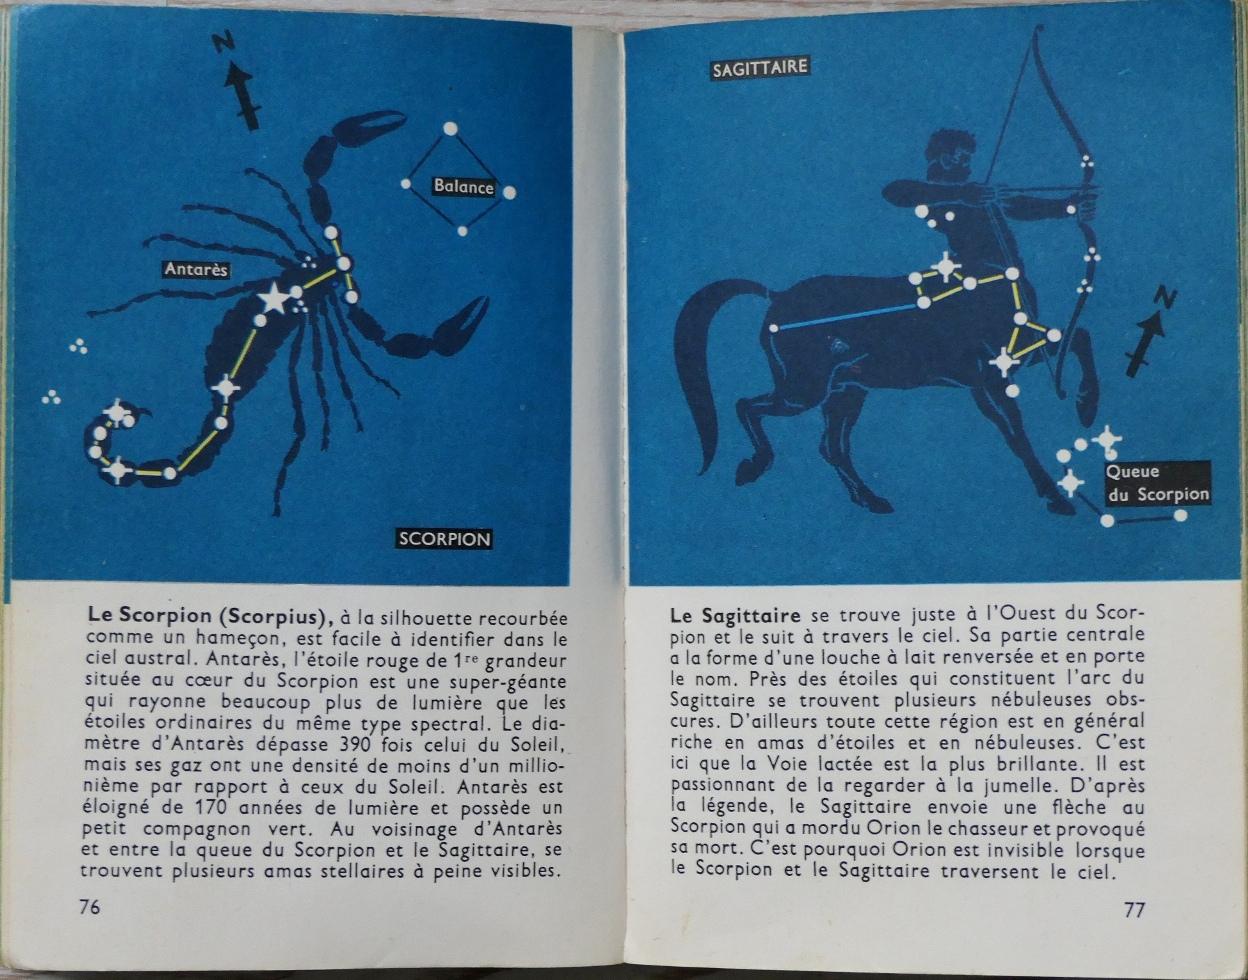 Etoiles_Hachette_1963_Scorpion-Sagittaire_P1080721.JPG.c980f8831bc405ce207869e63ffa4860.JPG